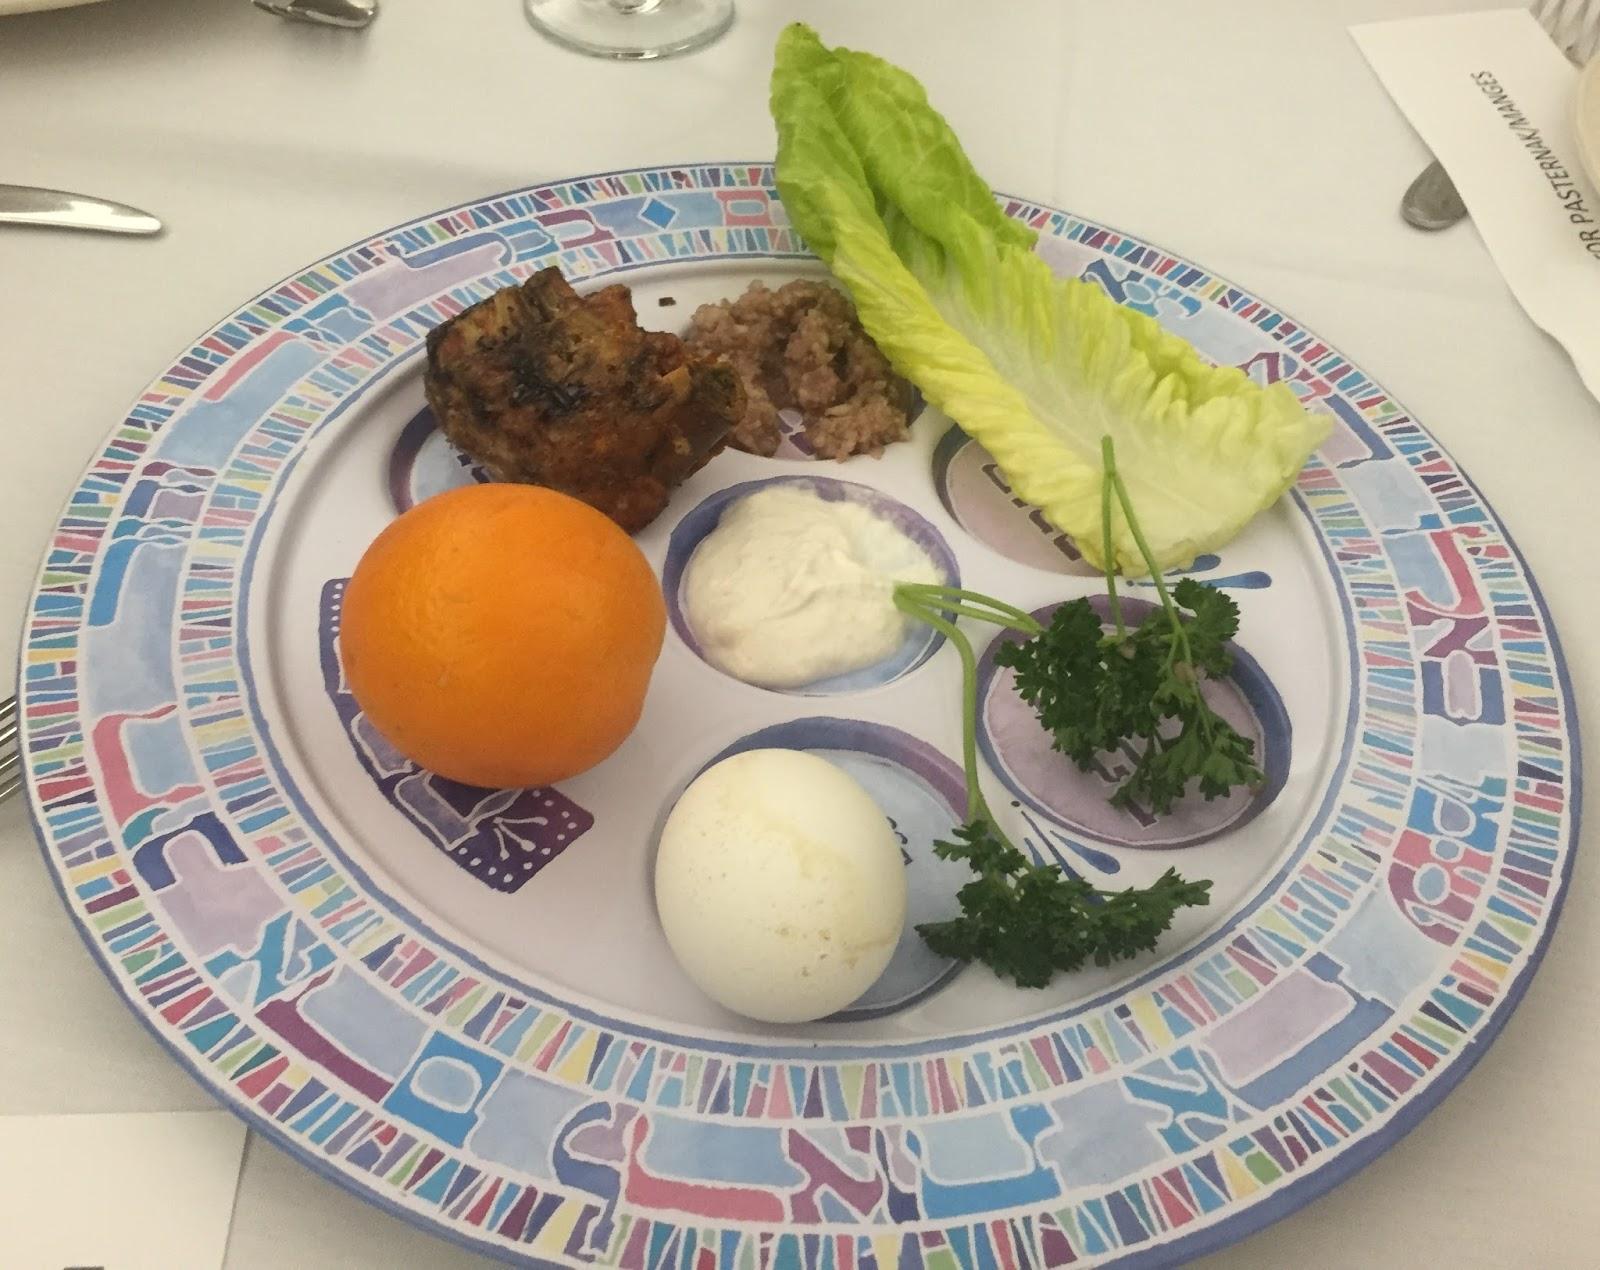 The Splintered Mind Orange On The Seder Plate